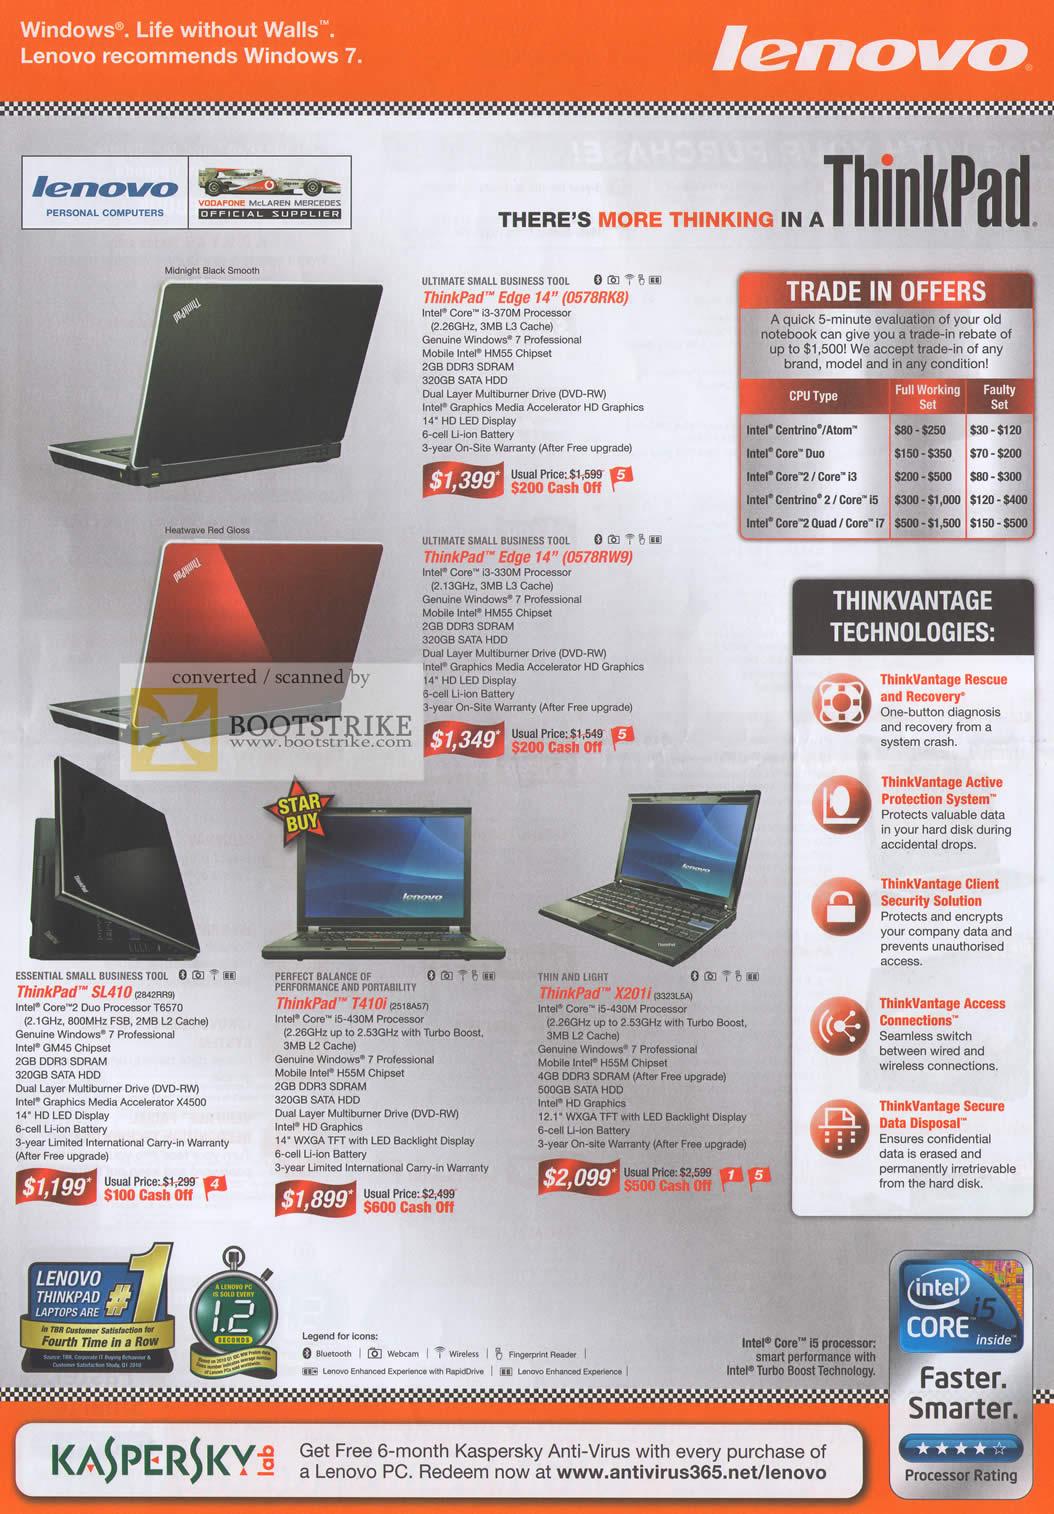 Comex 2010 price list image brochure of Lenovo Notebooks ThinkPad Edge 14 SL410 T410i X201i Thinkvantage